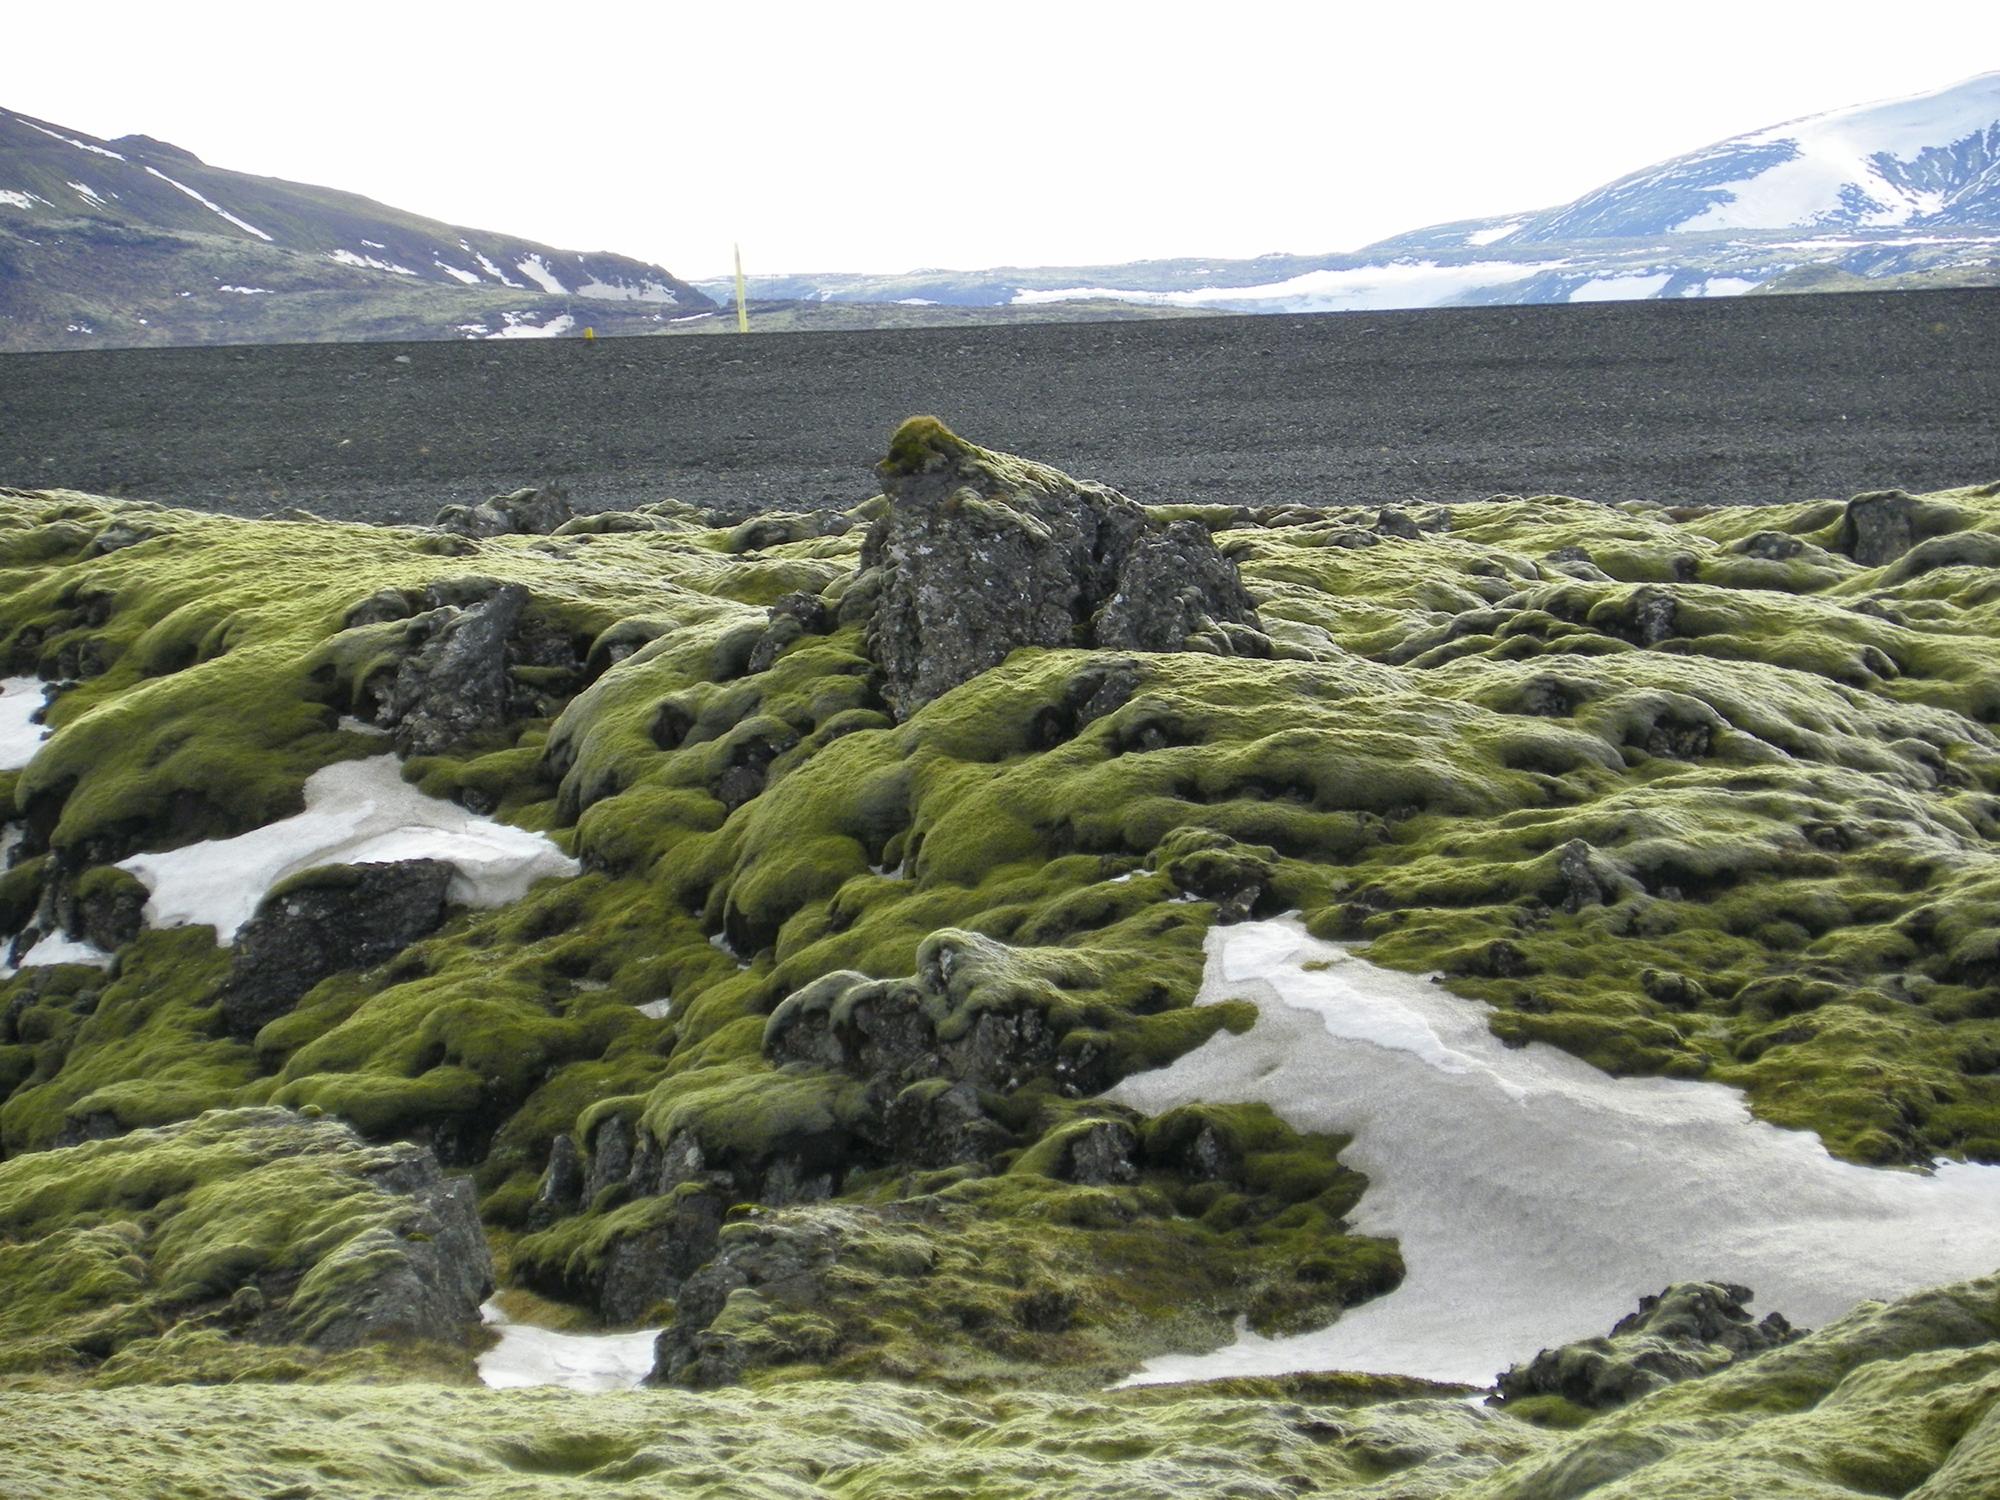 Iceland's lava fields